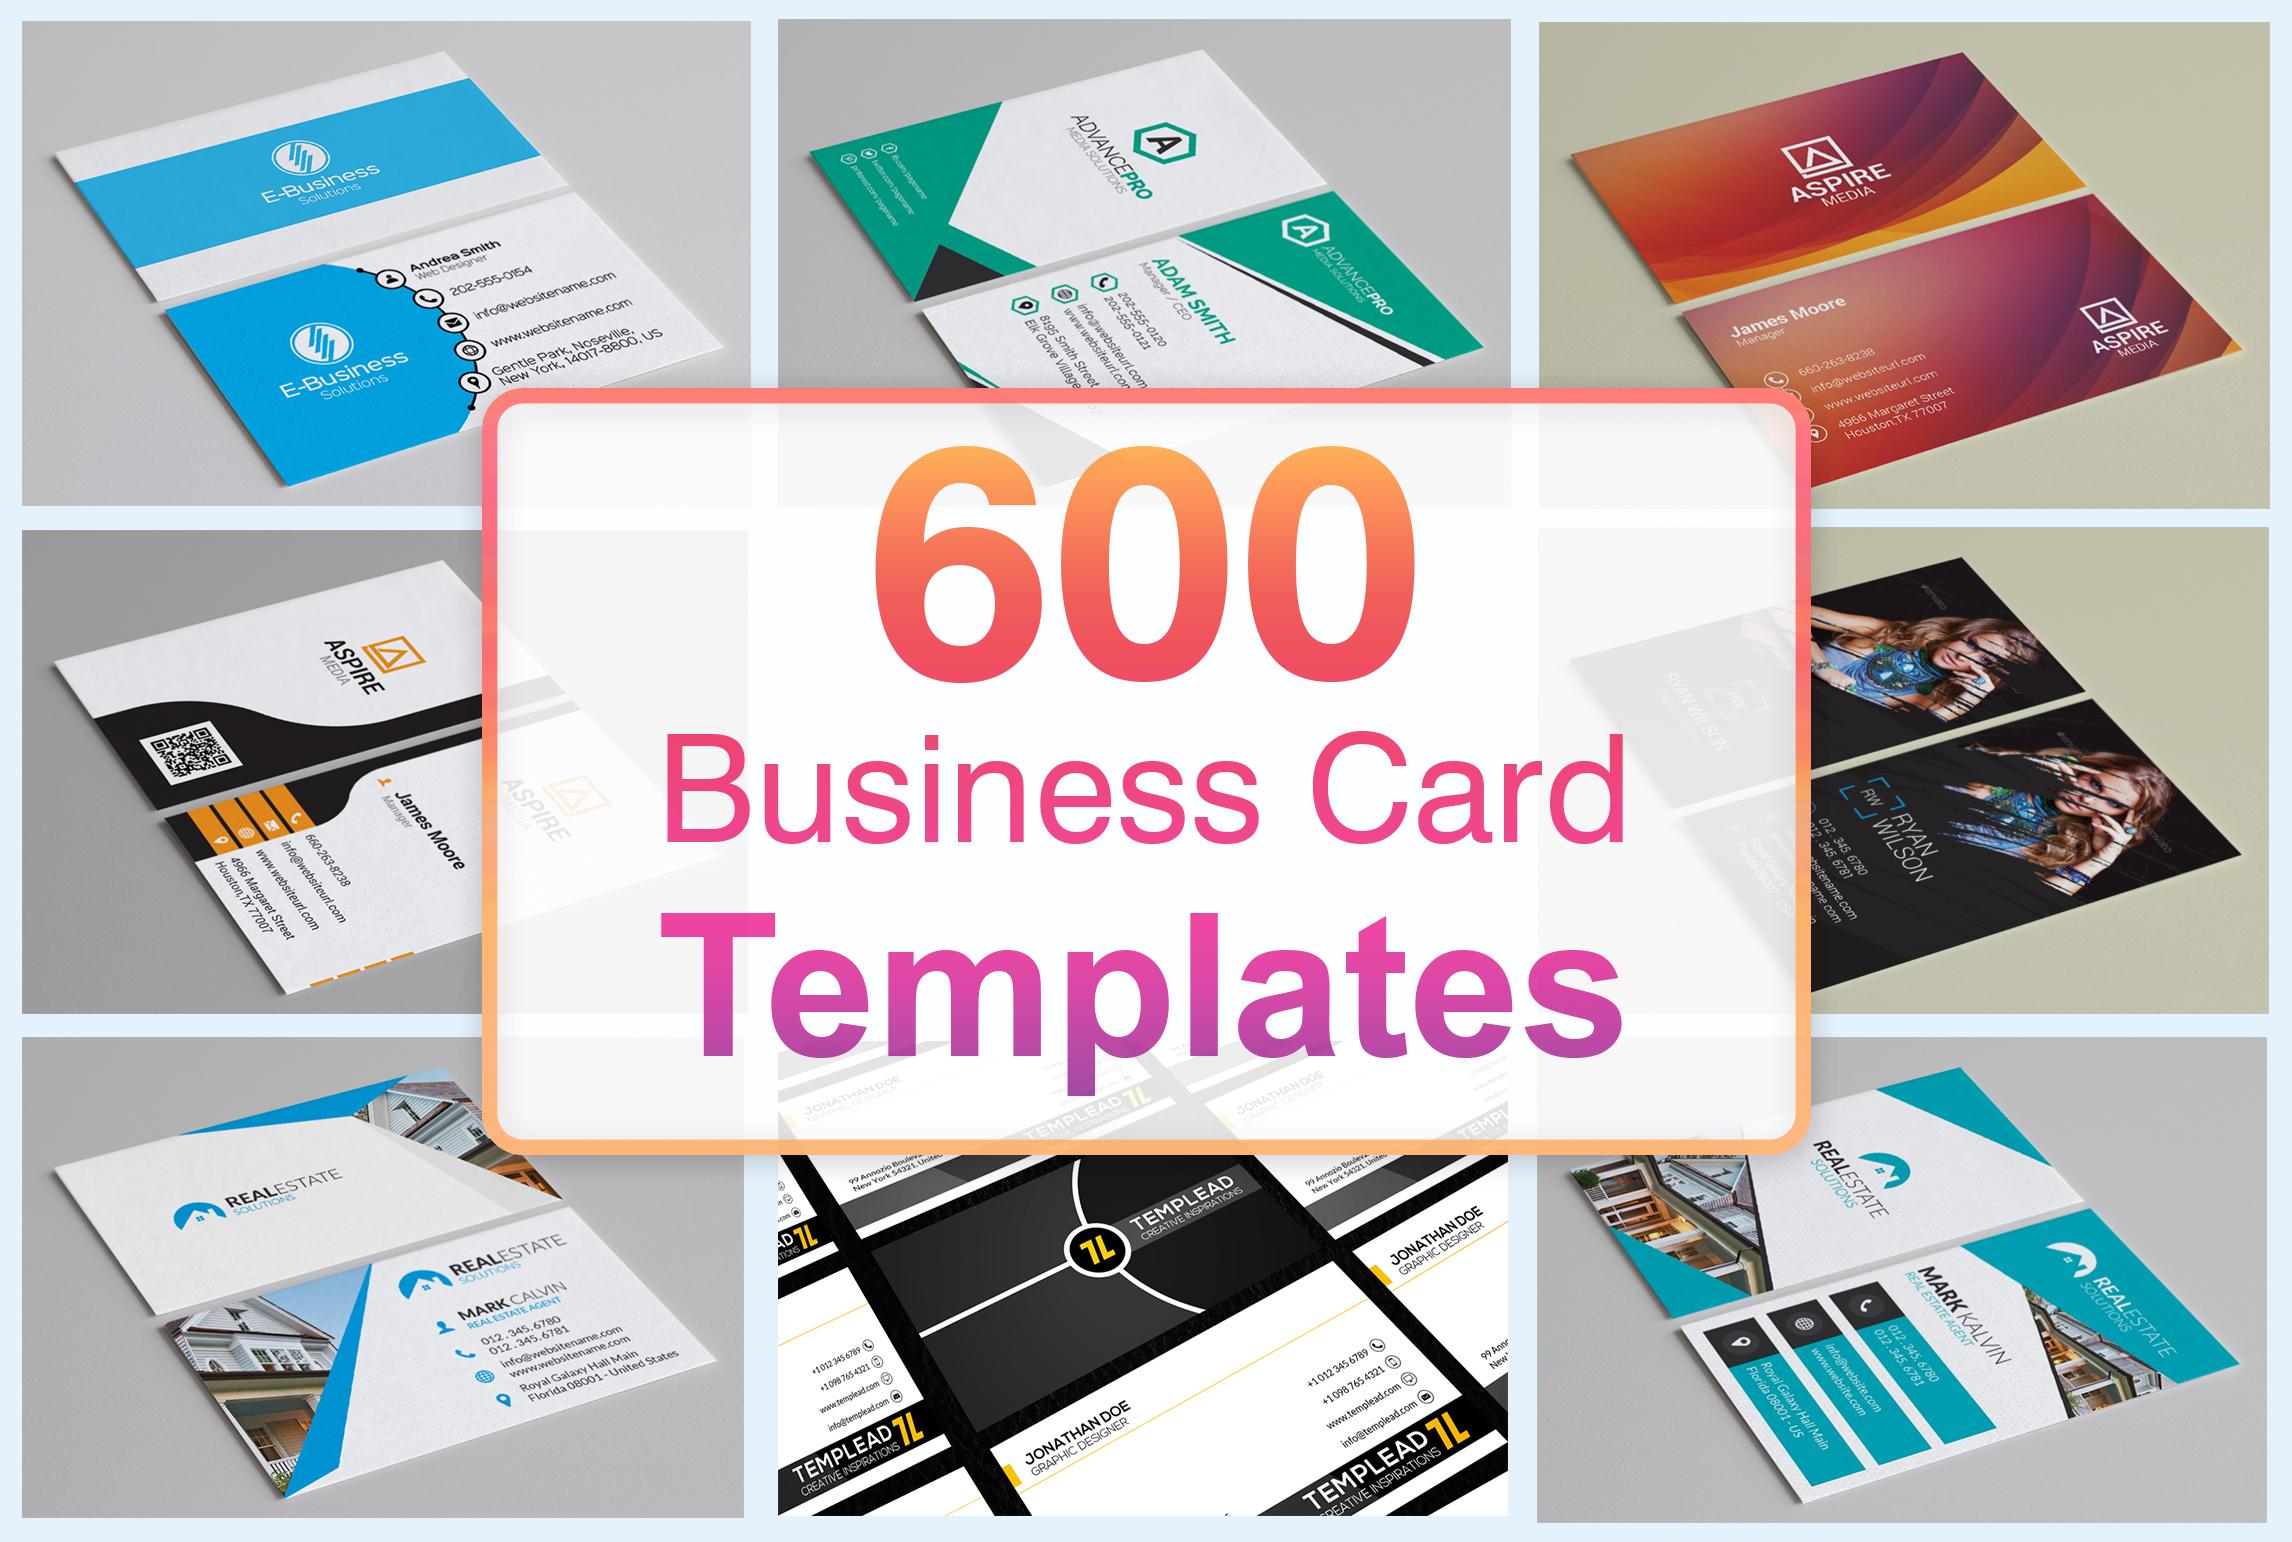 600 Business Card Templates PSD